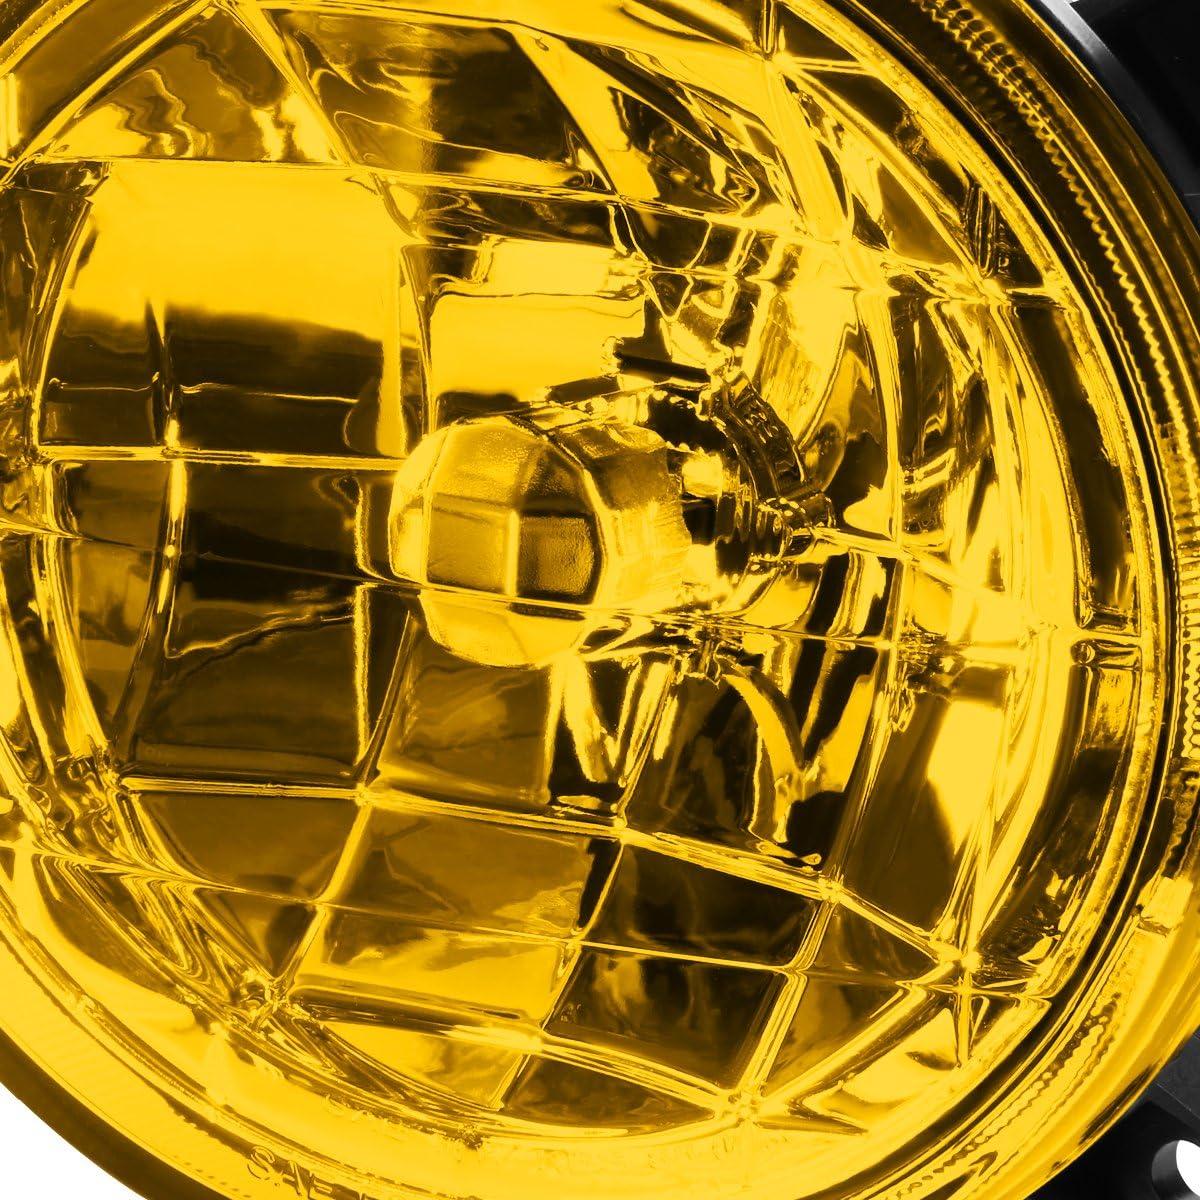 DNA Motoring FL-T036-AM Fog Light Assembly Driver /& Passenger Side